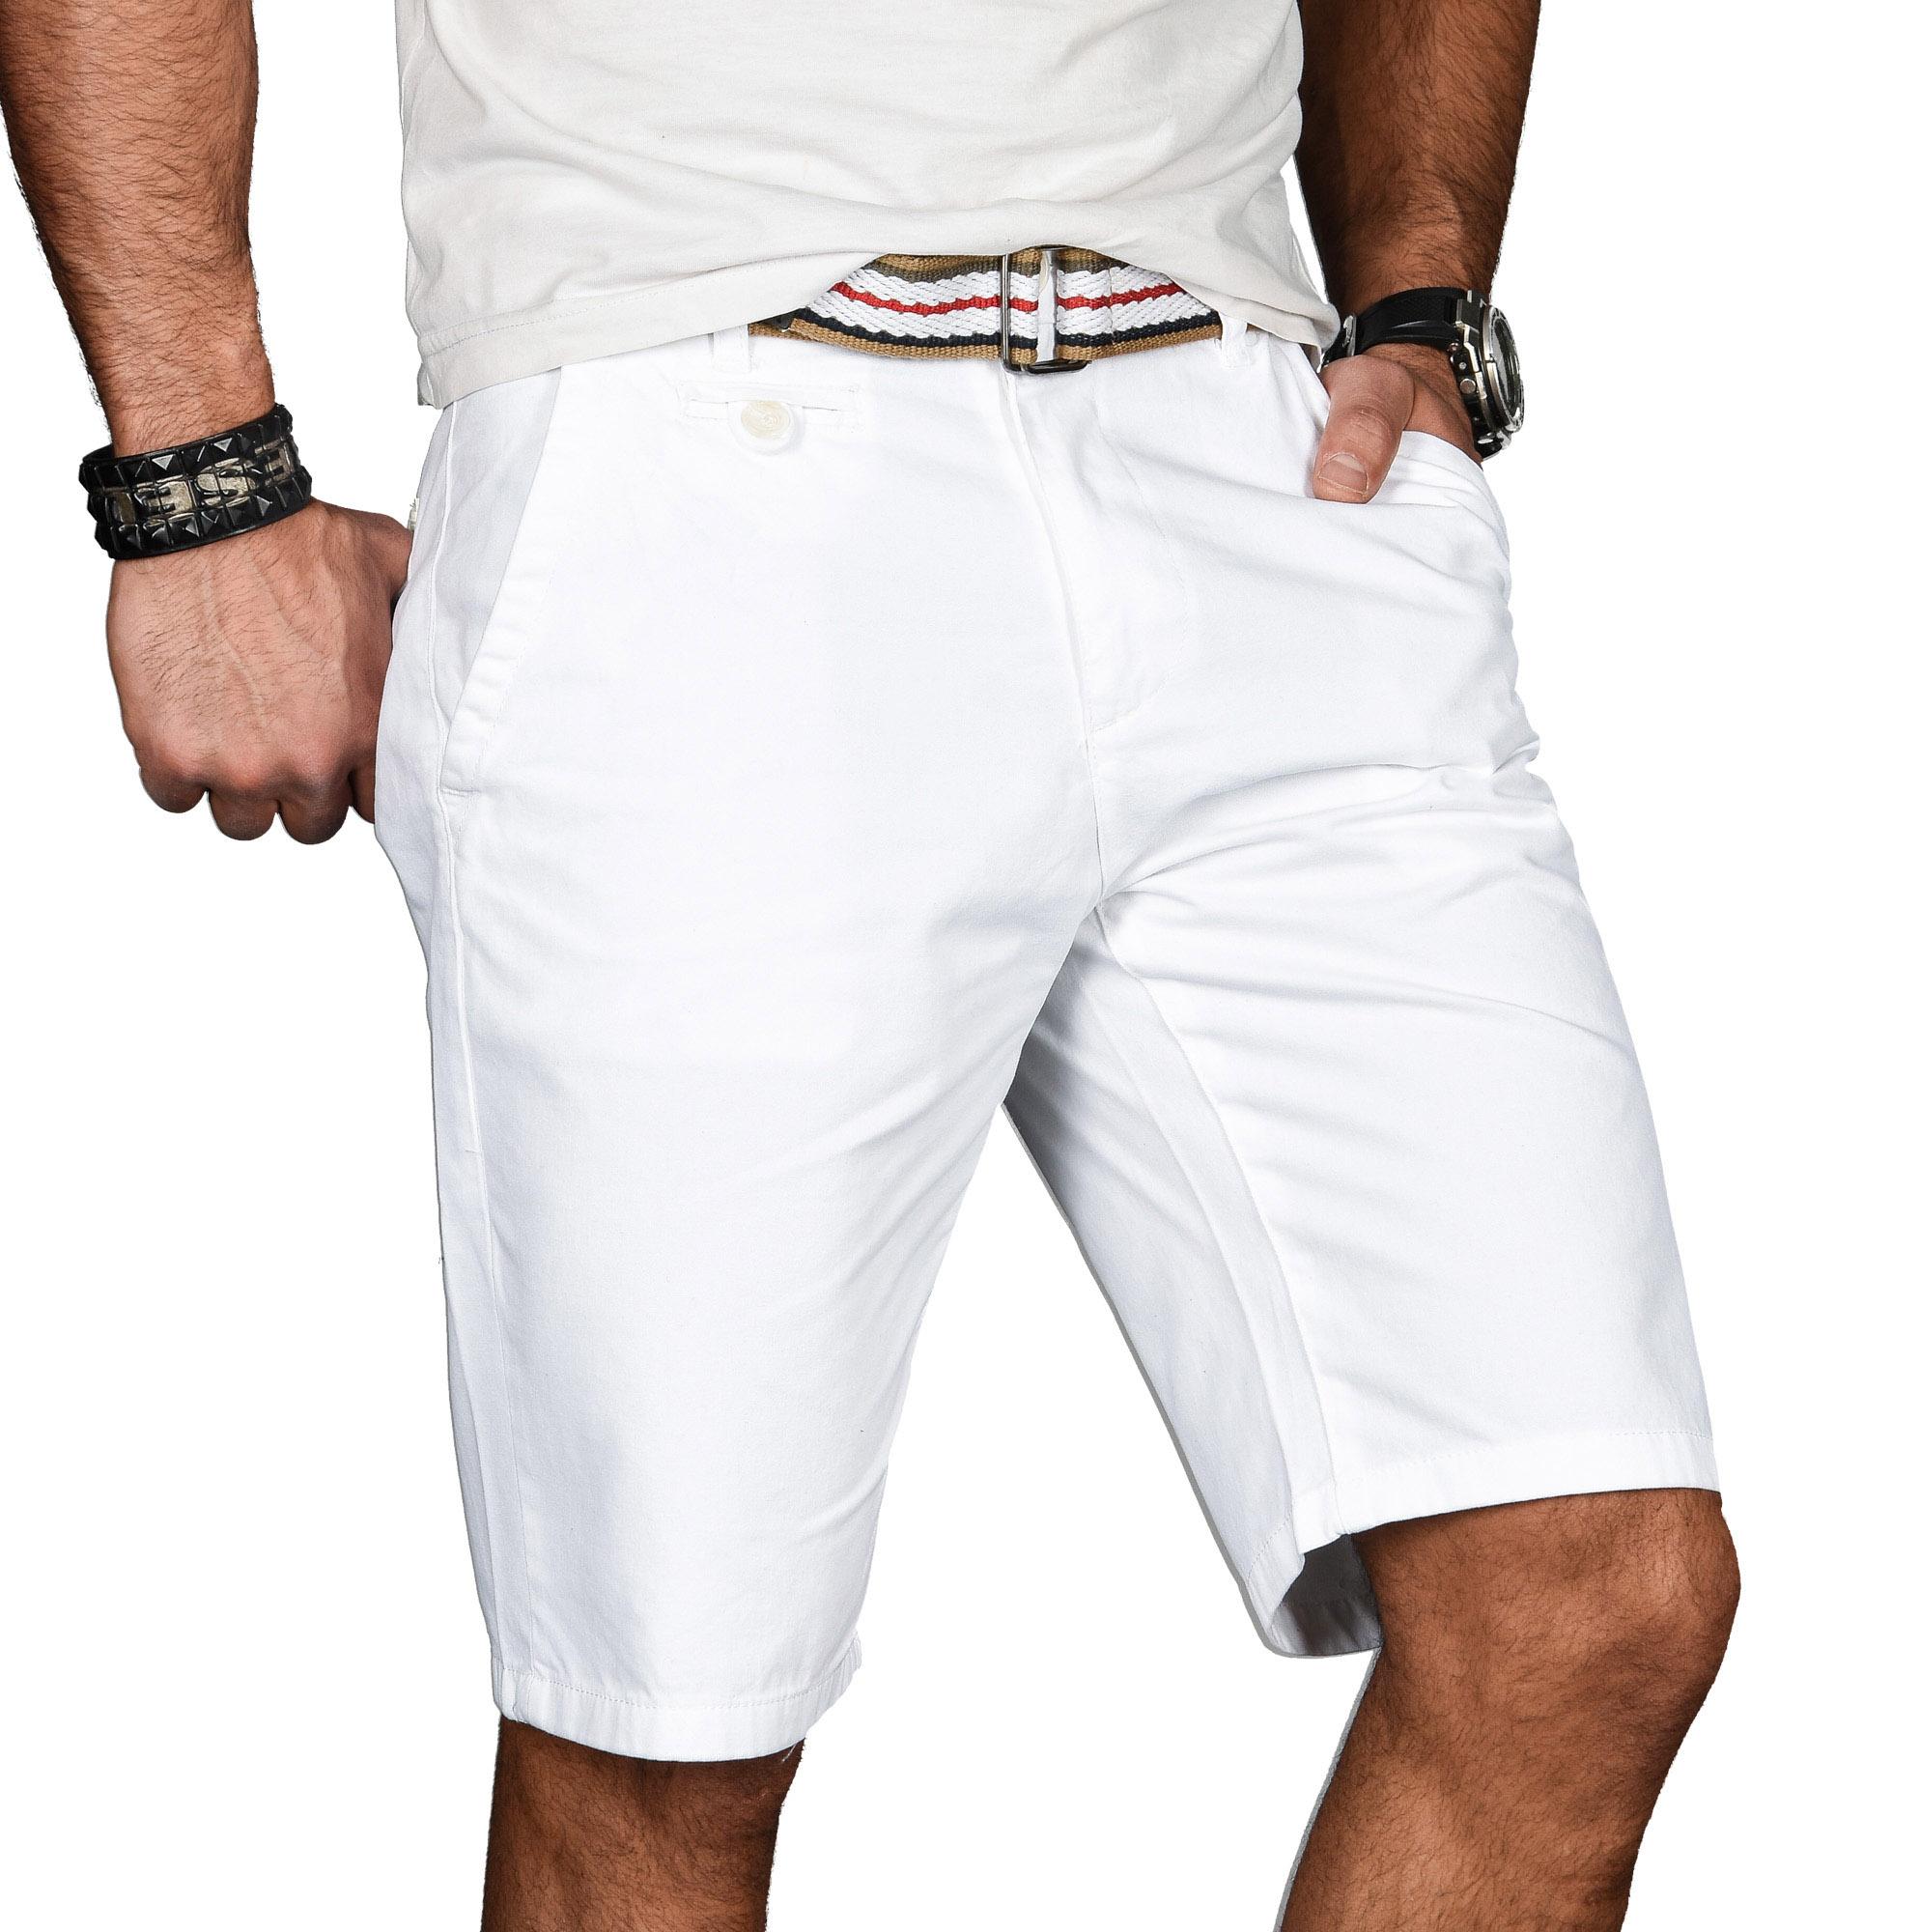 A-Salvarini-Herren-Shorts-kurze-Sommer-Hose-mit-Guertel-Short-Bermuda-NEU-AS096 Indexbild 22